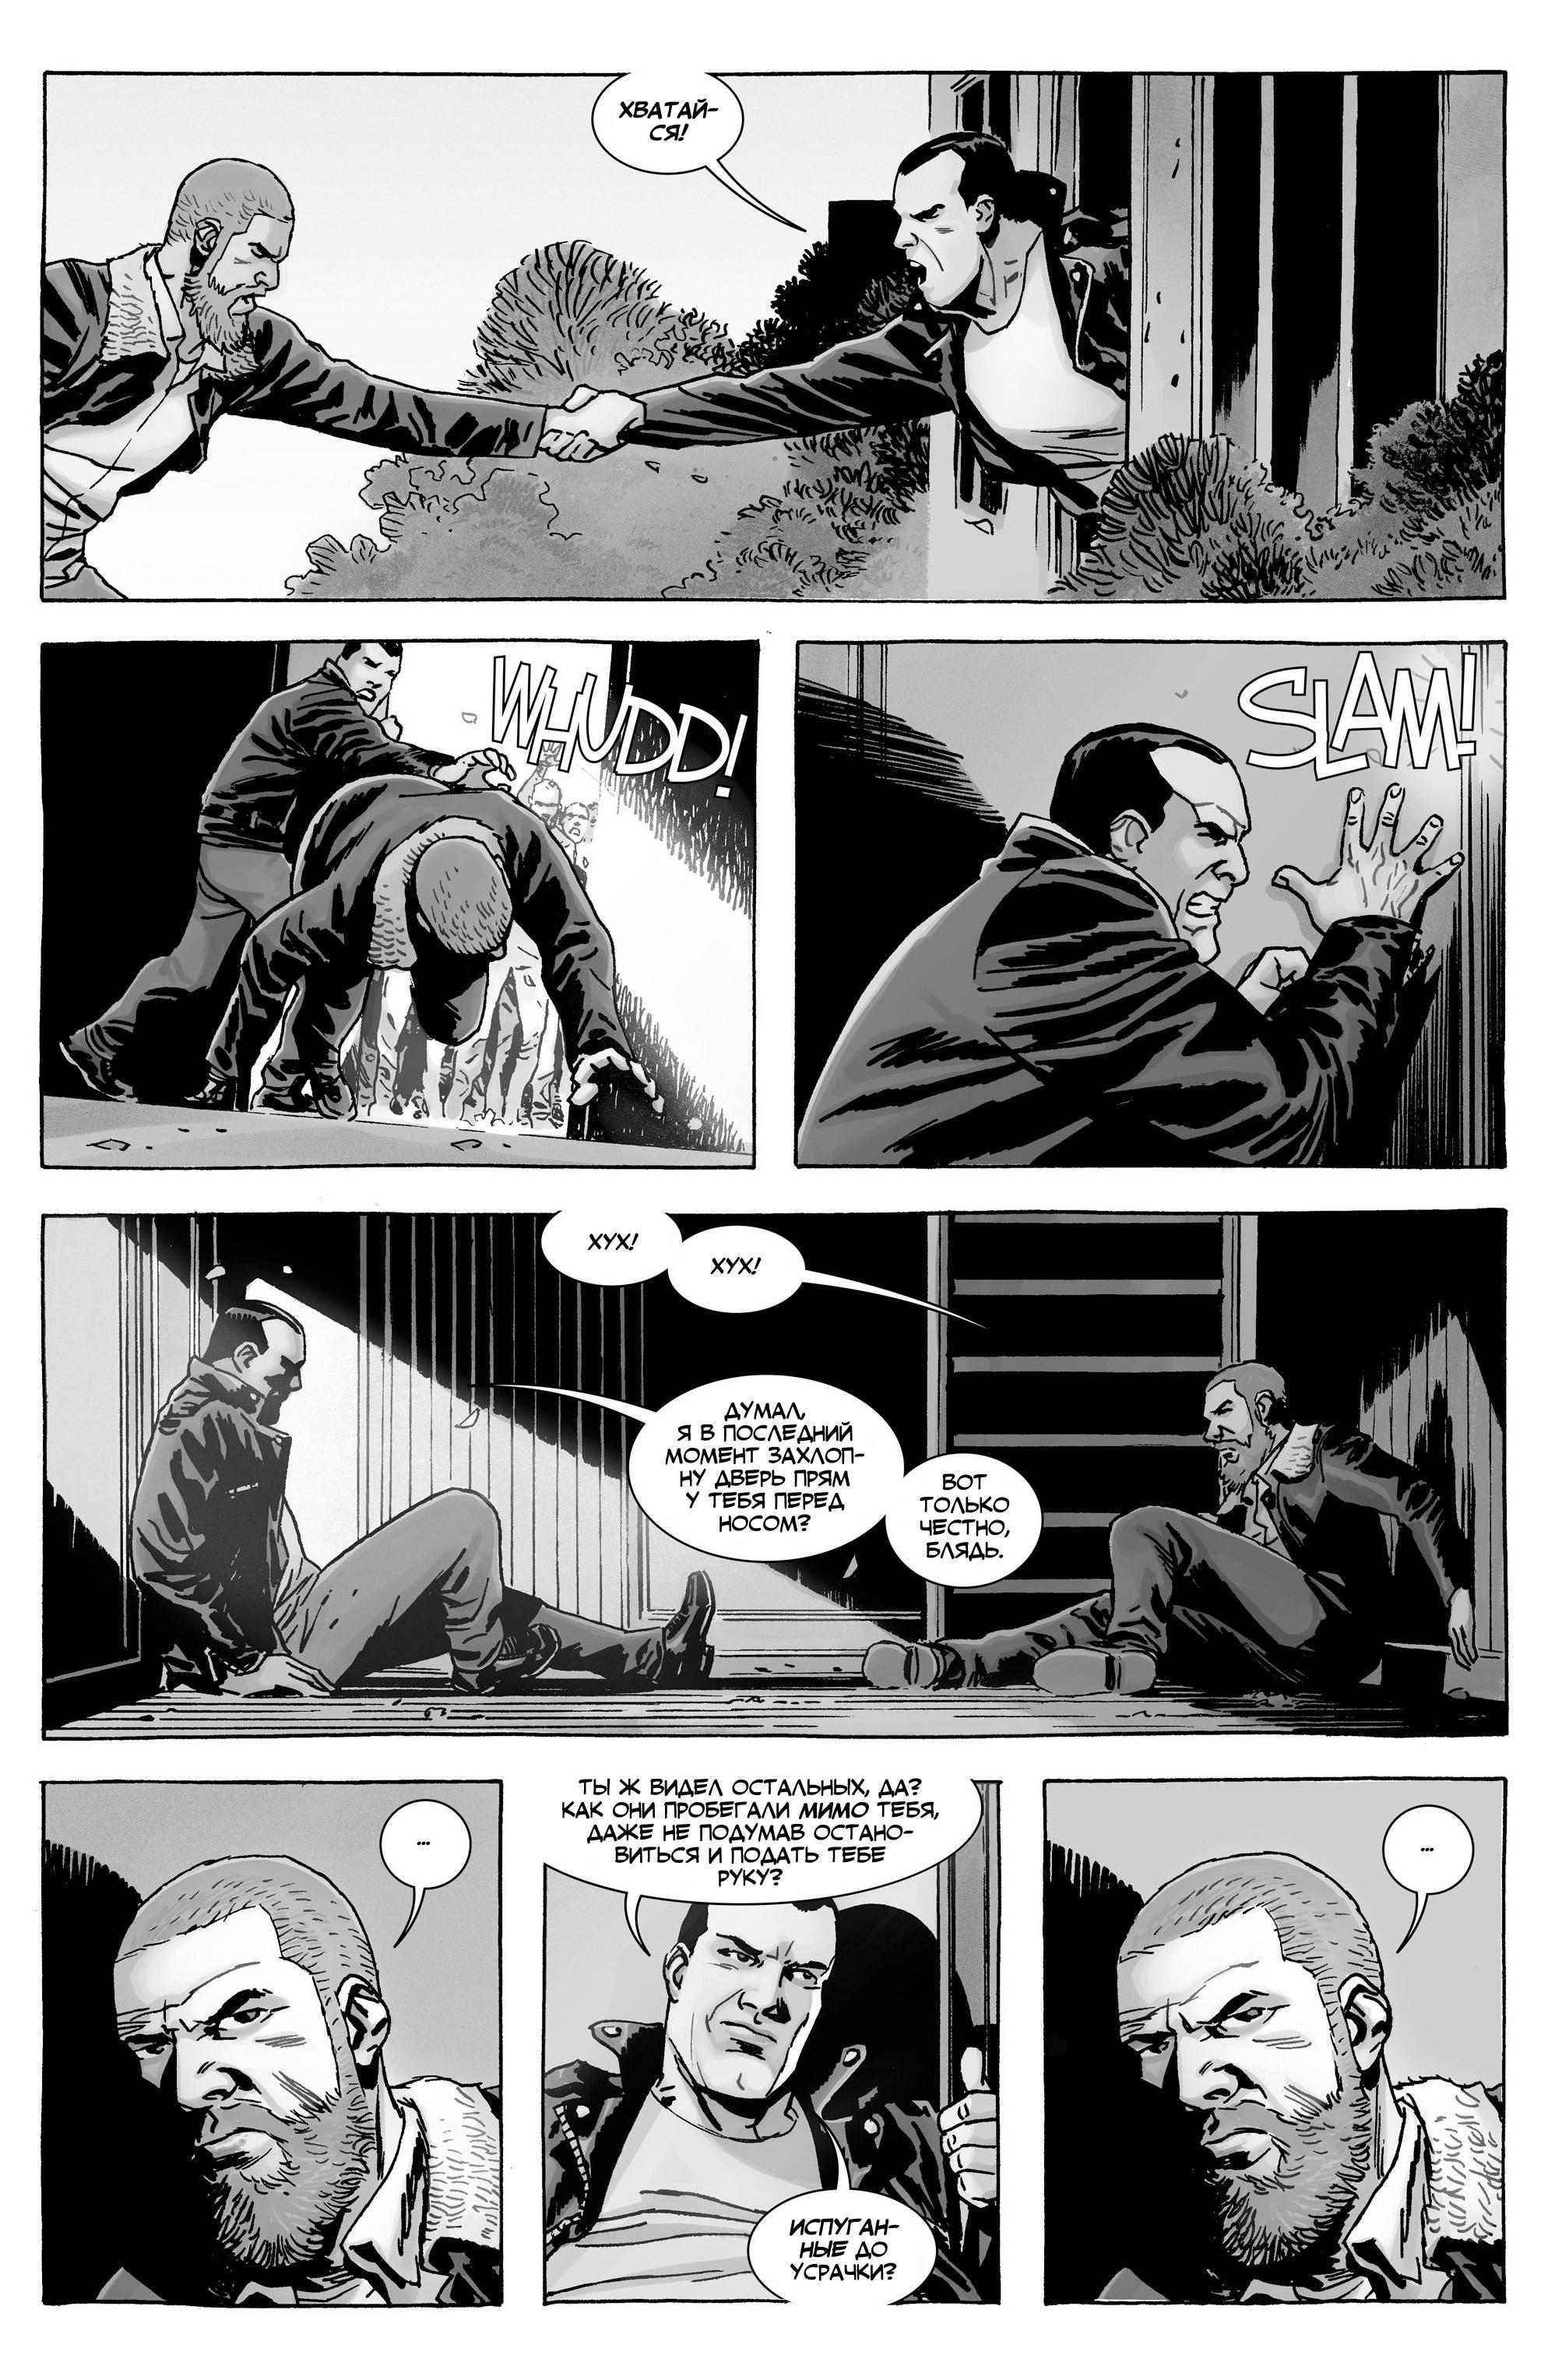 http://img1.unicomics.com/comics/the-walking-dead/the-walking-dead-164/07.jpg